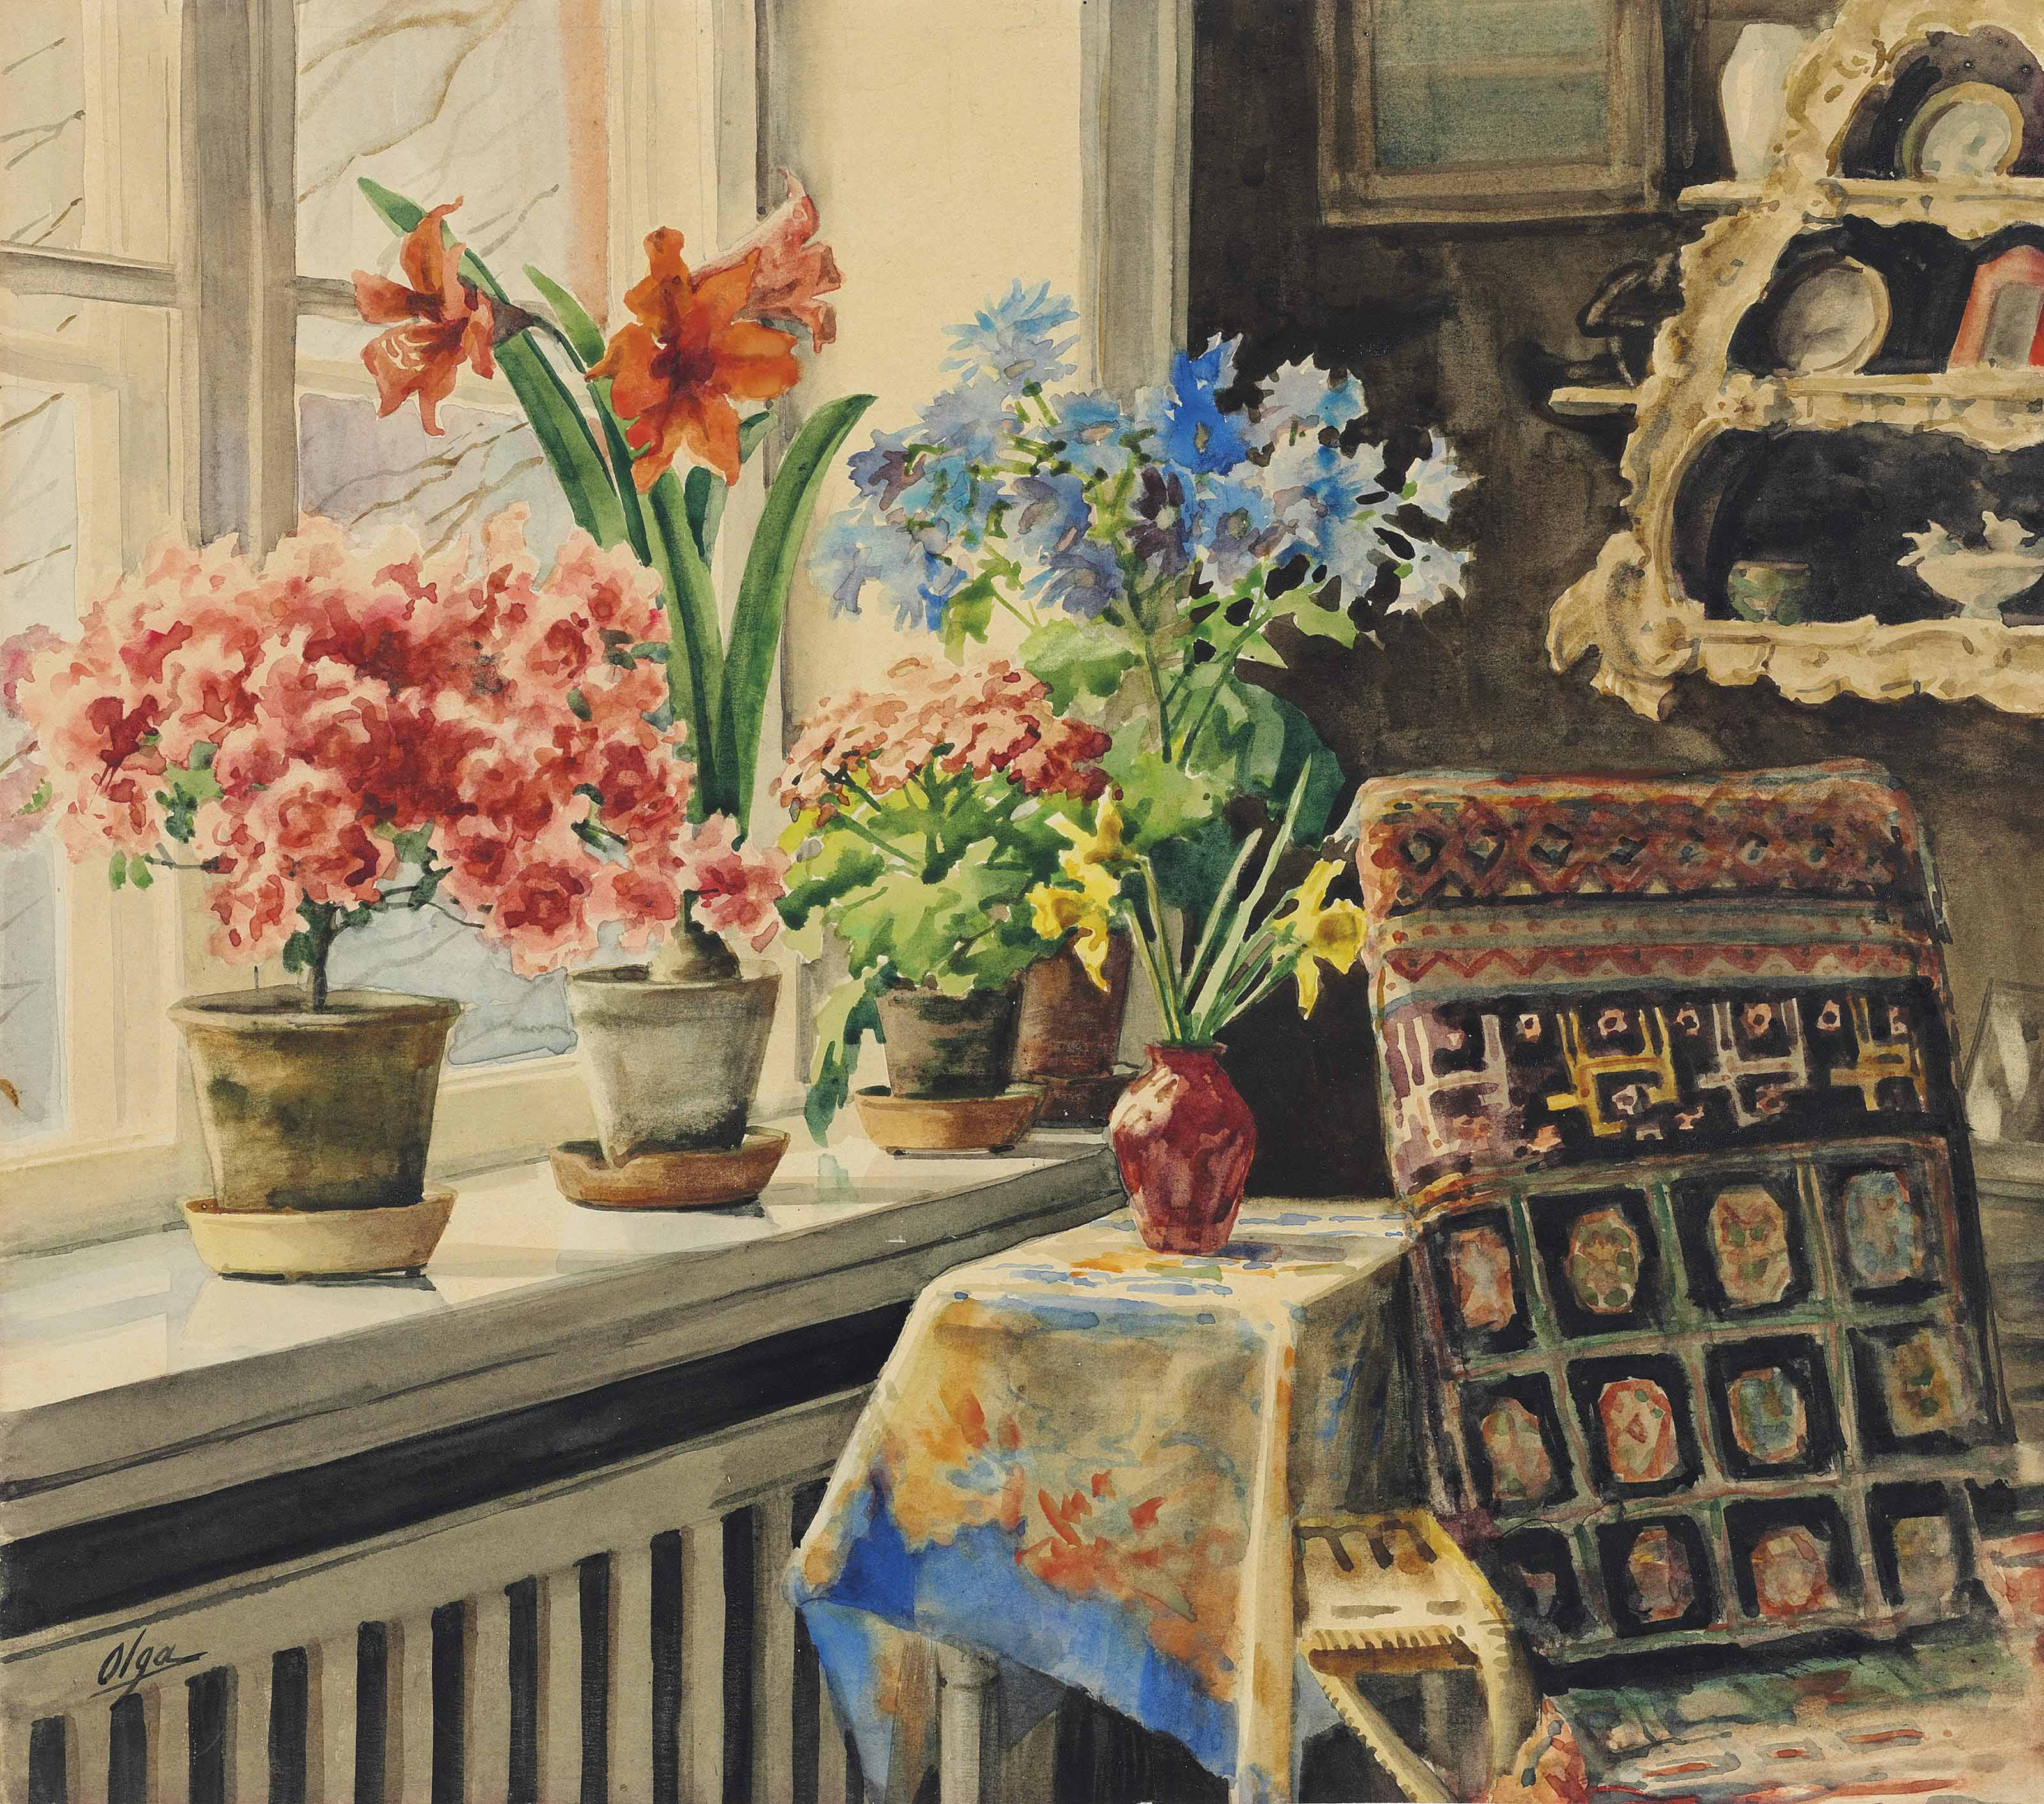 Still life with azaleas, amaryllis, geraniums, cornflowers and daffodils